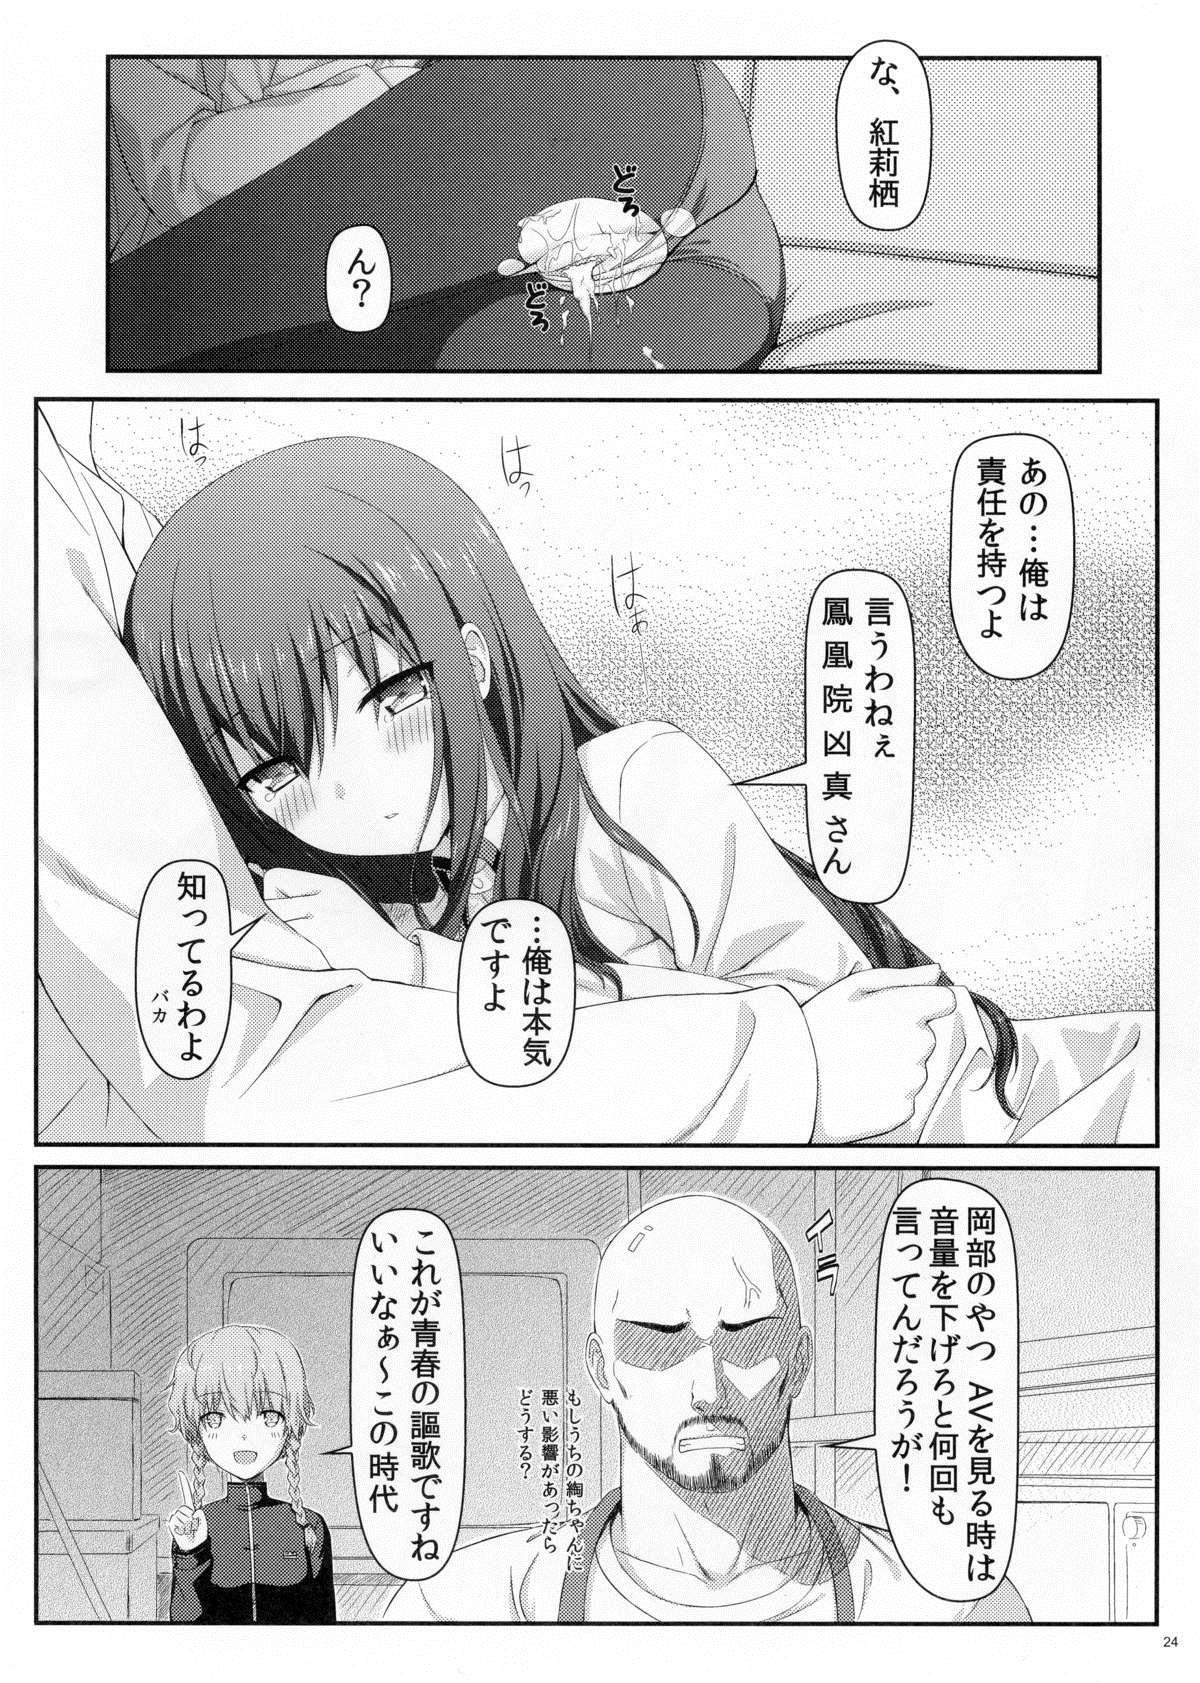 Tengoku e no Bullet Train 22